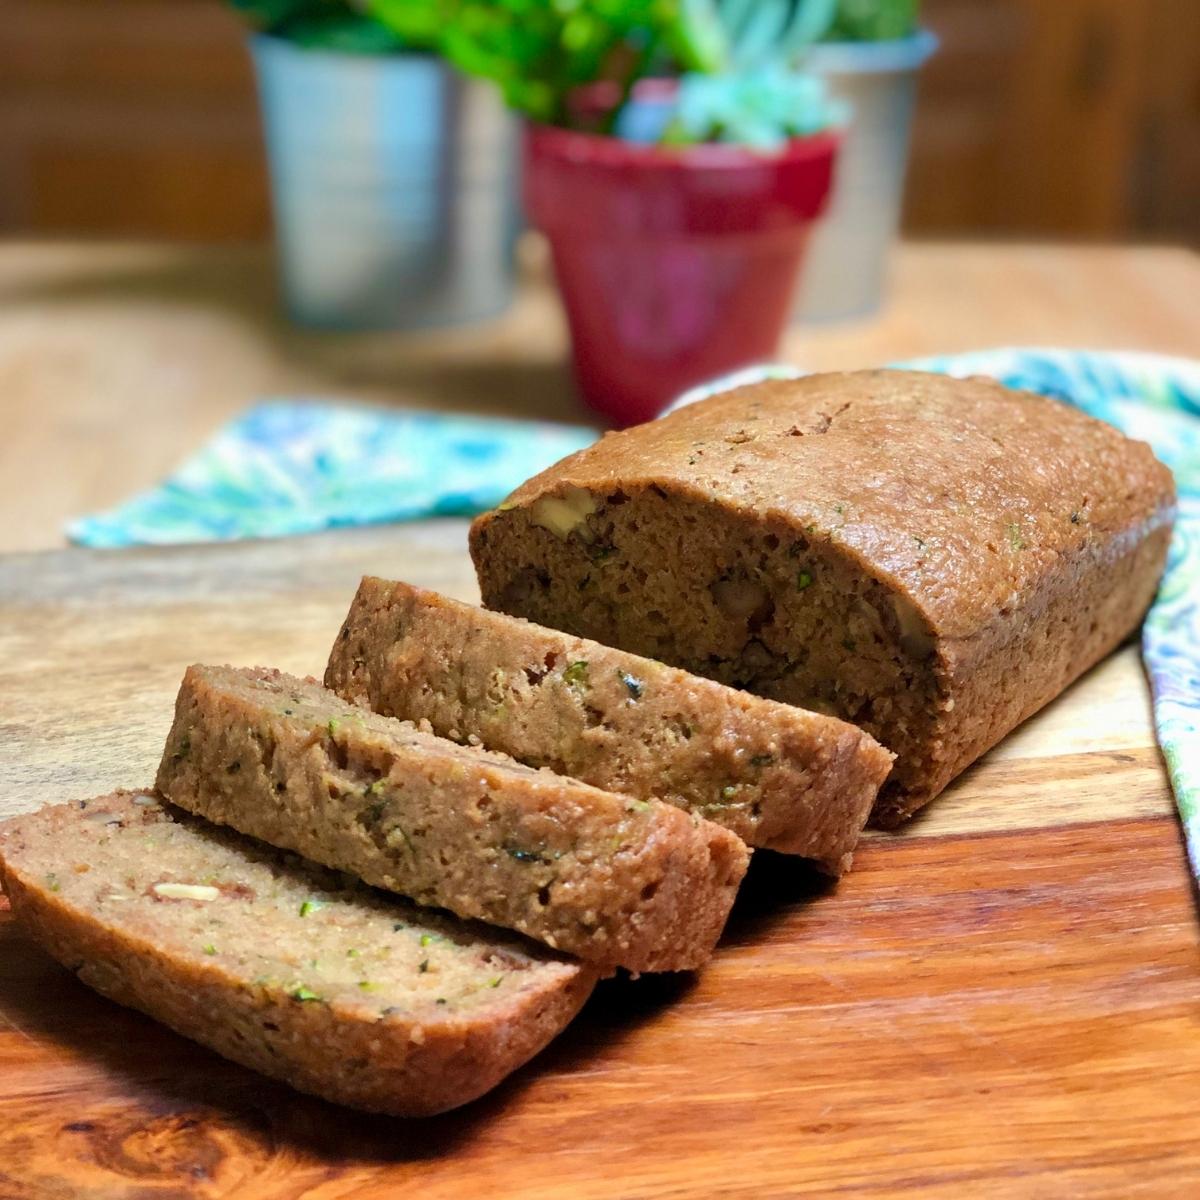 A sliced loaf of simple vegan zucchini bread on a wood cutting board.